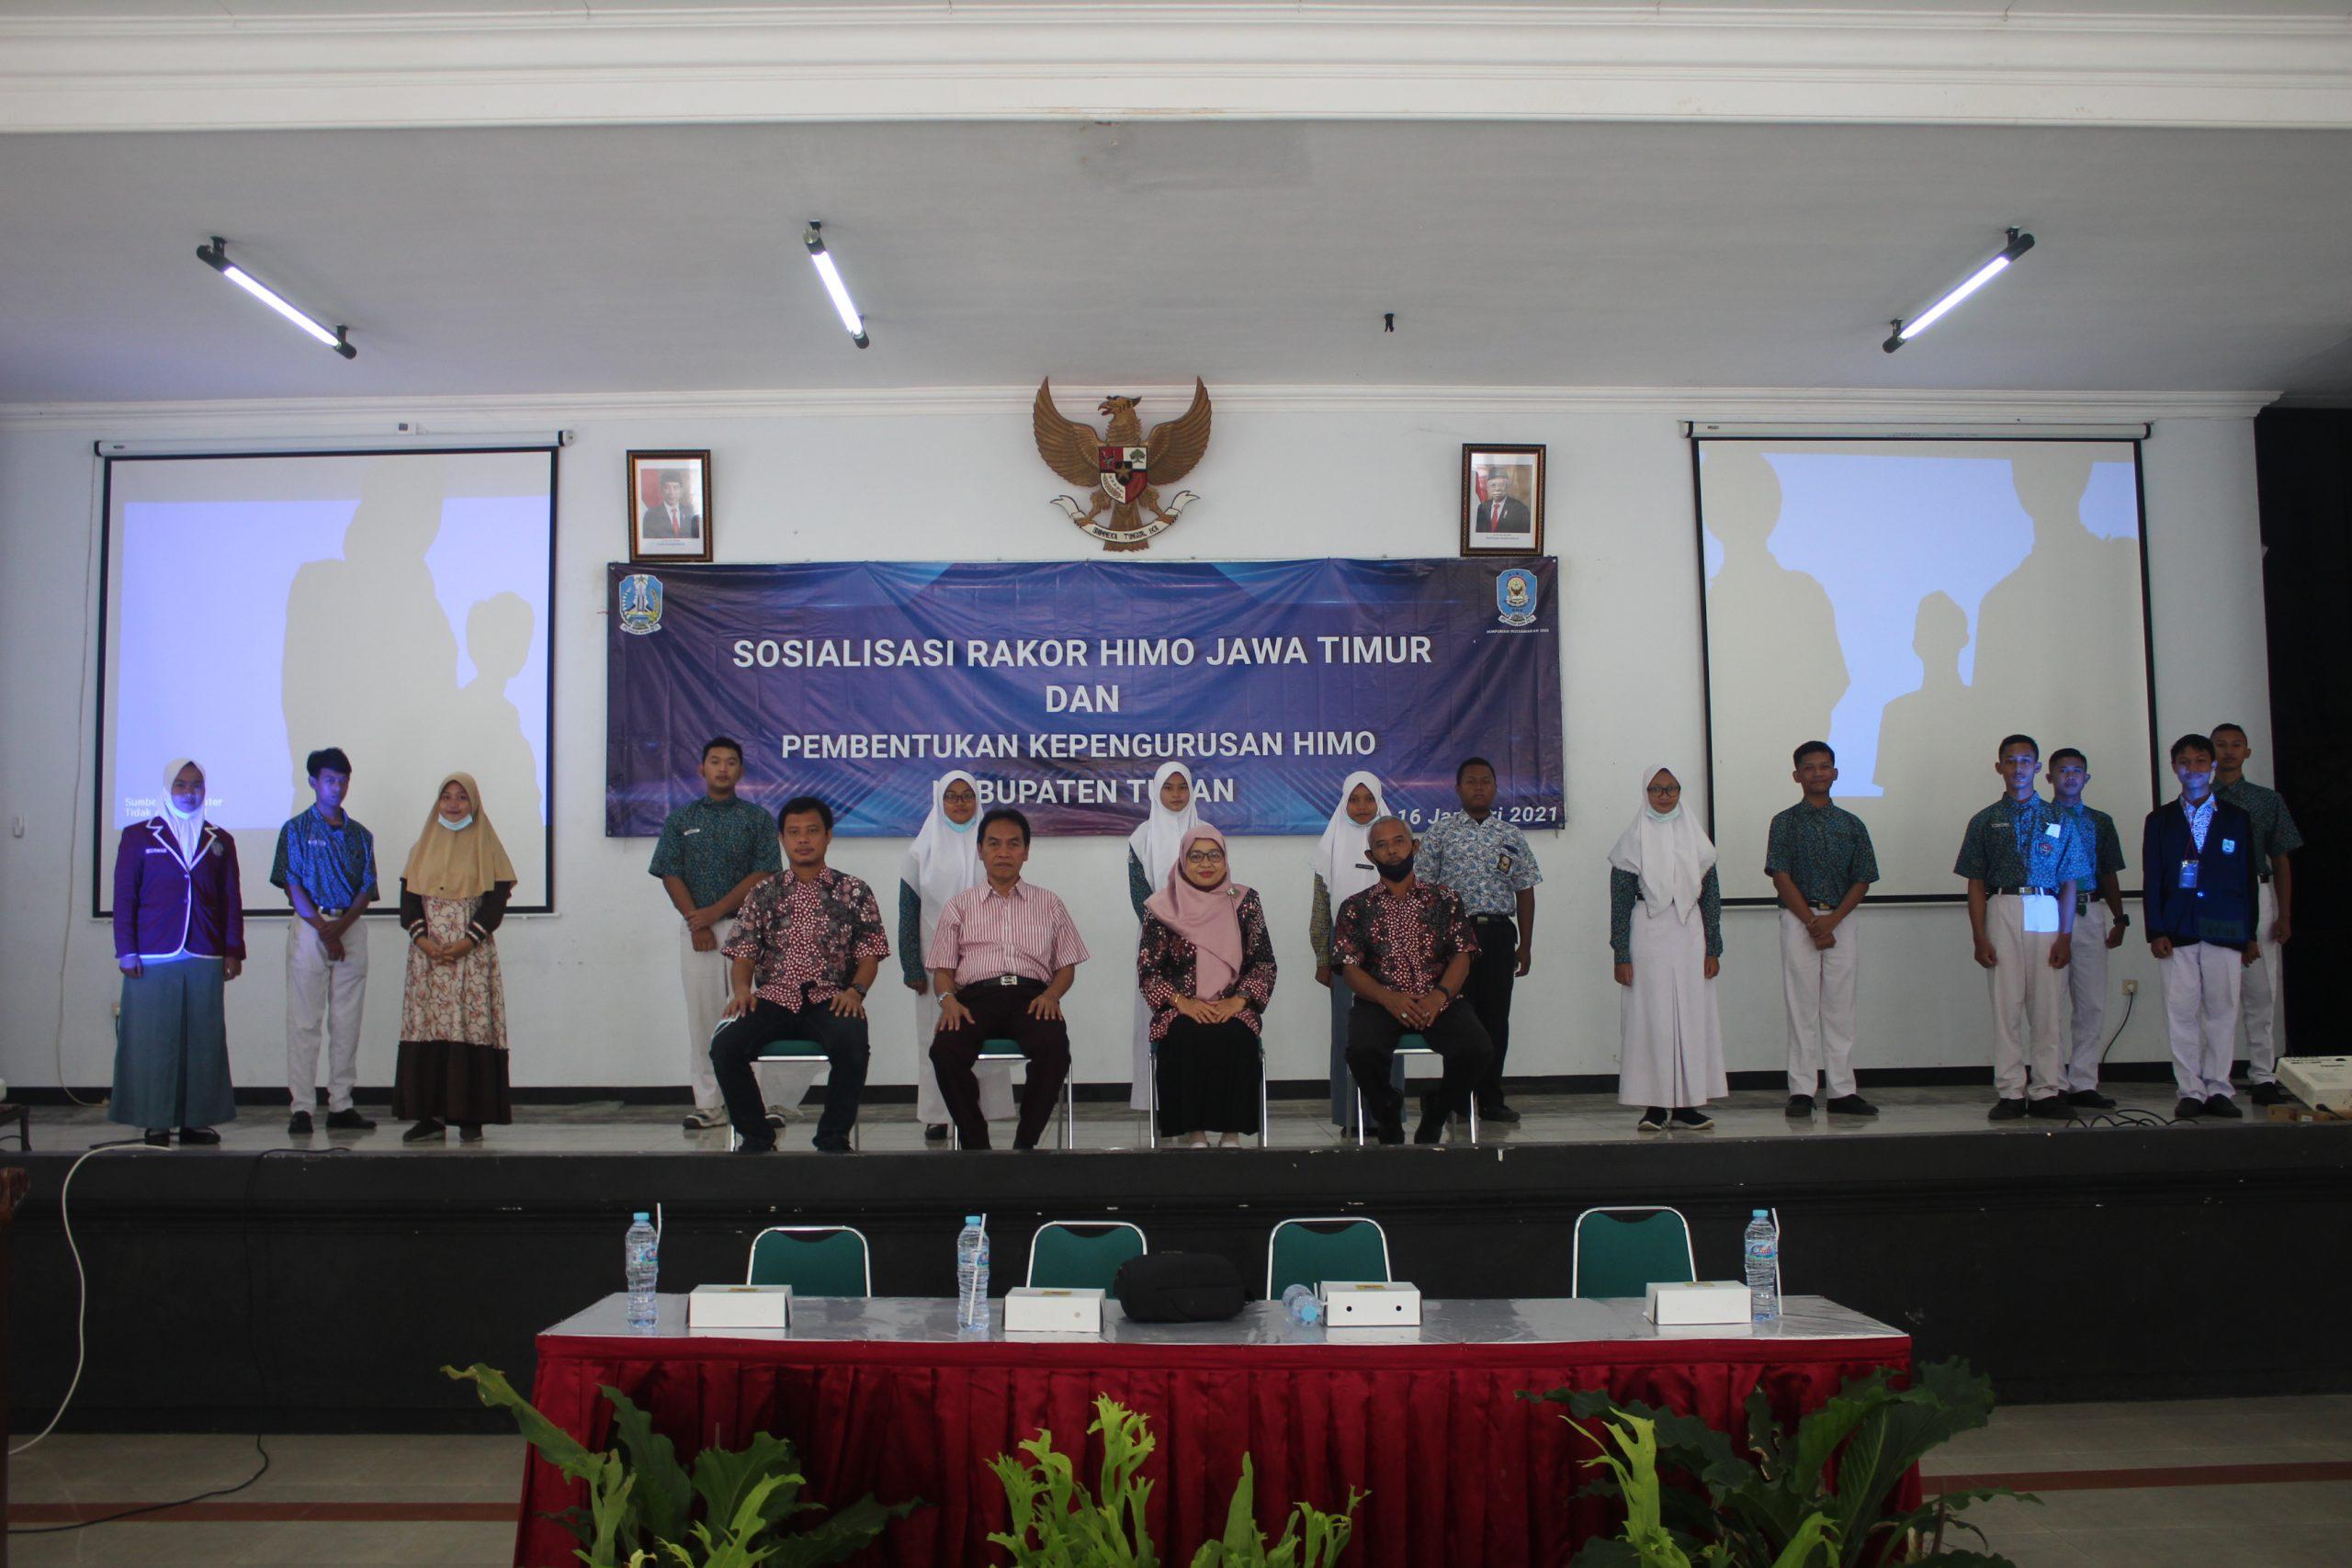 Pembentukan Kepengurusan HIMO Kabupaten Tuban